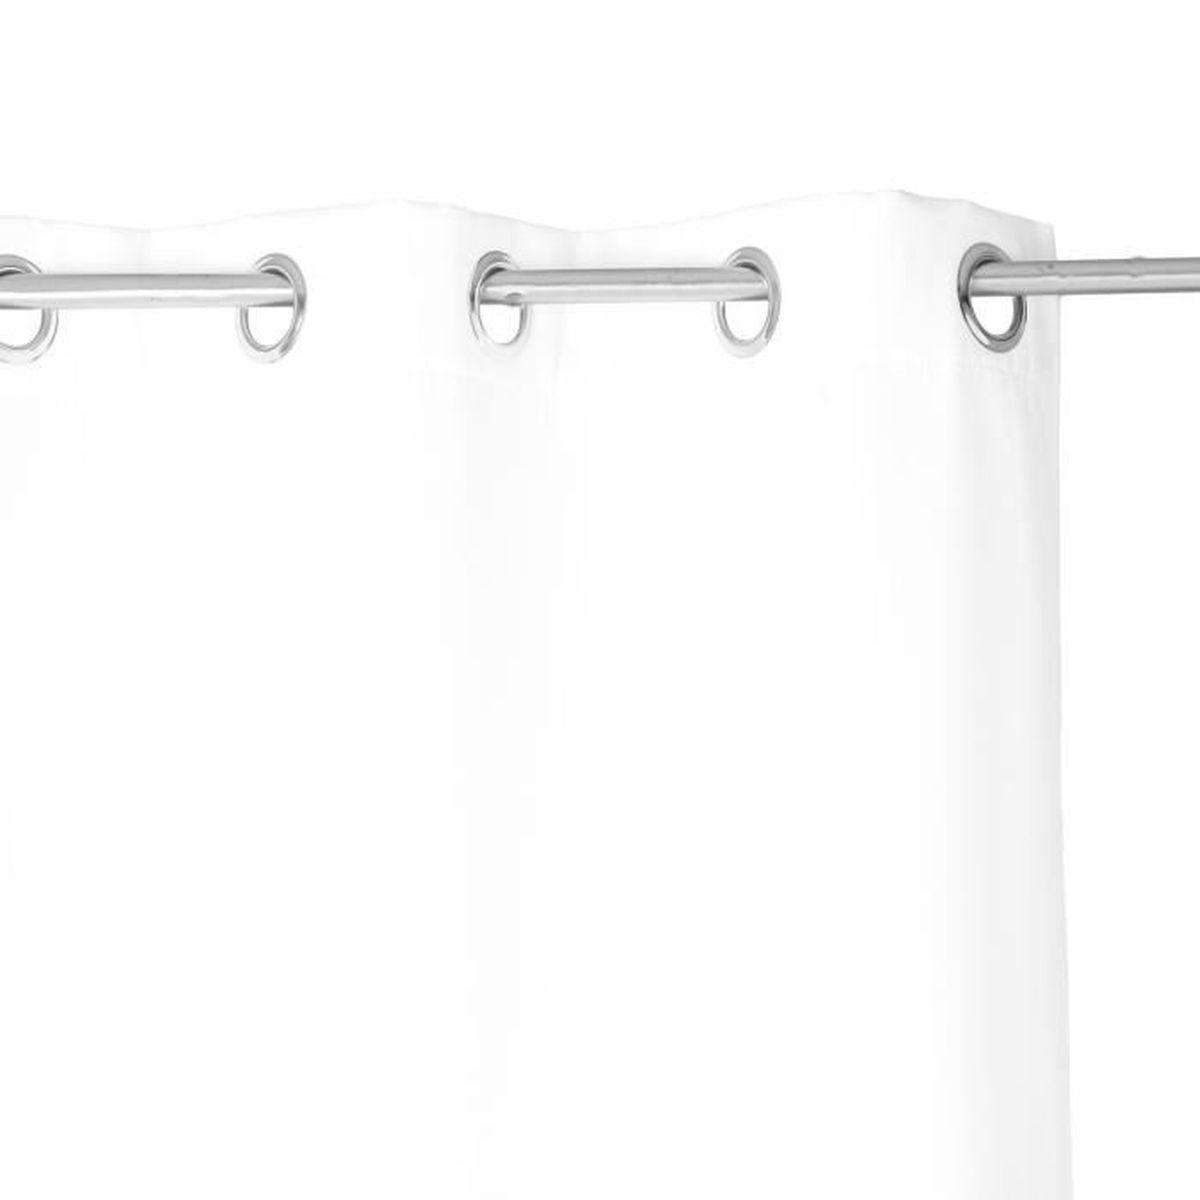 rideau isolant 140 x 260 cm polyester ivoire achat vente rideau cdiscount. Black Bedroom Furniture Sets. Home Design Ideas